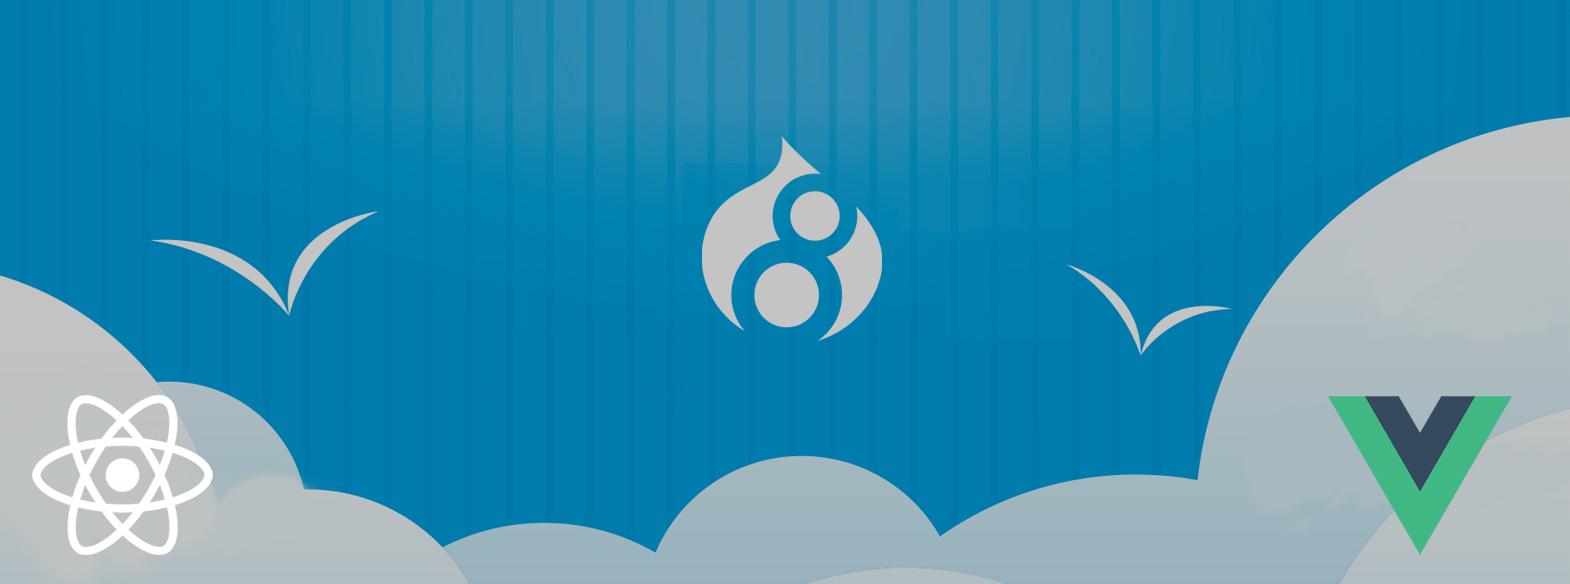 Douce Infotech Private Limited | Drupal, Drupal 7, Drupal 8